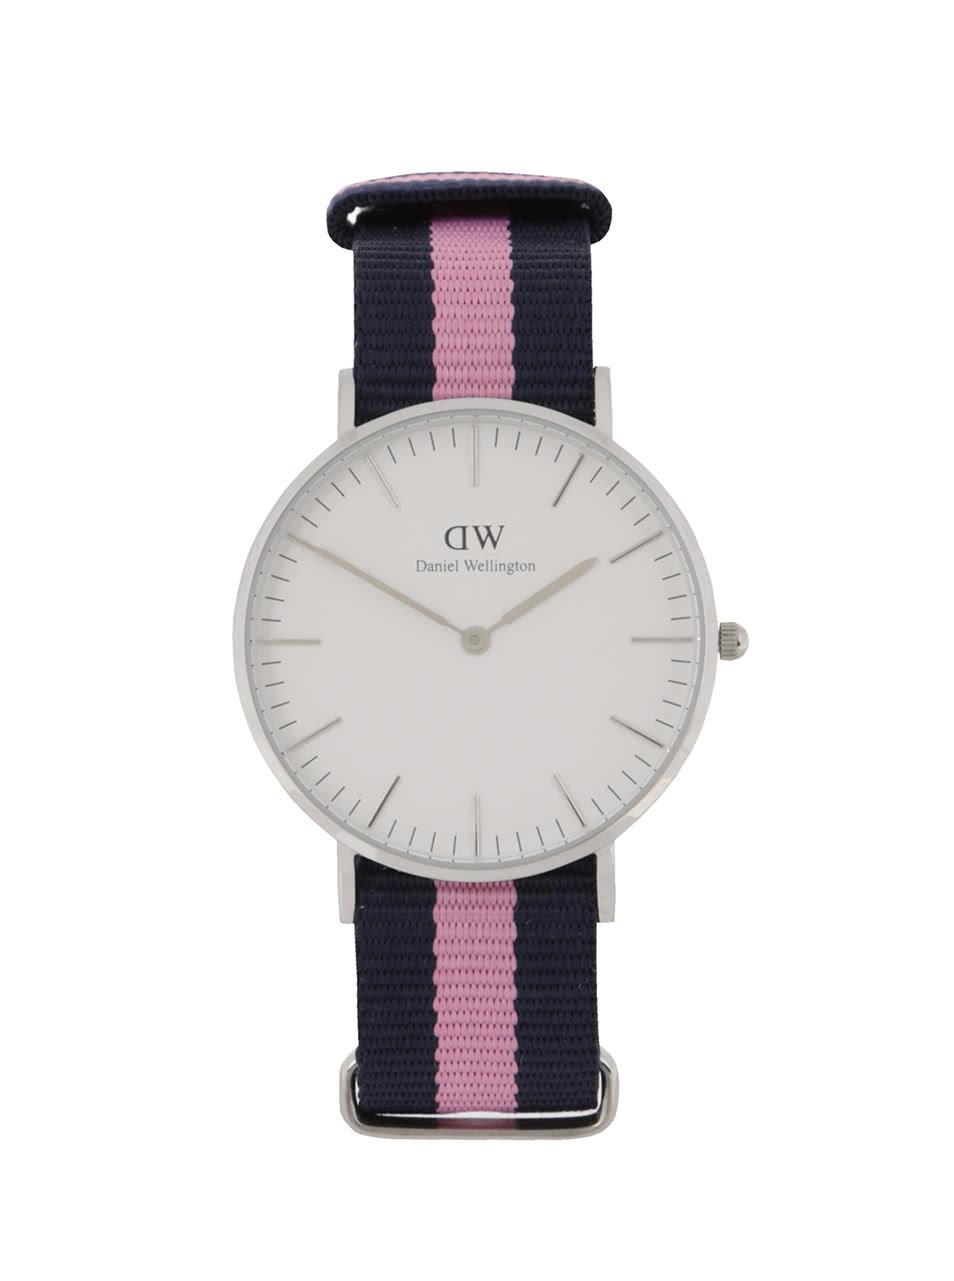 Dámske hodinky v striebornej farbe CLASSIC Winchester Daniel Wellington ... 5be53d58780